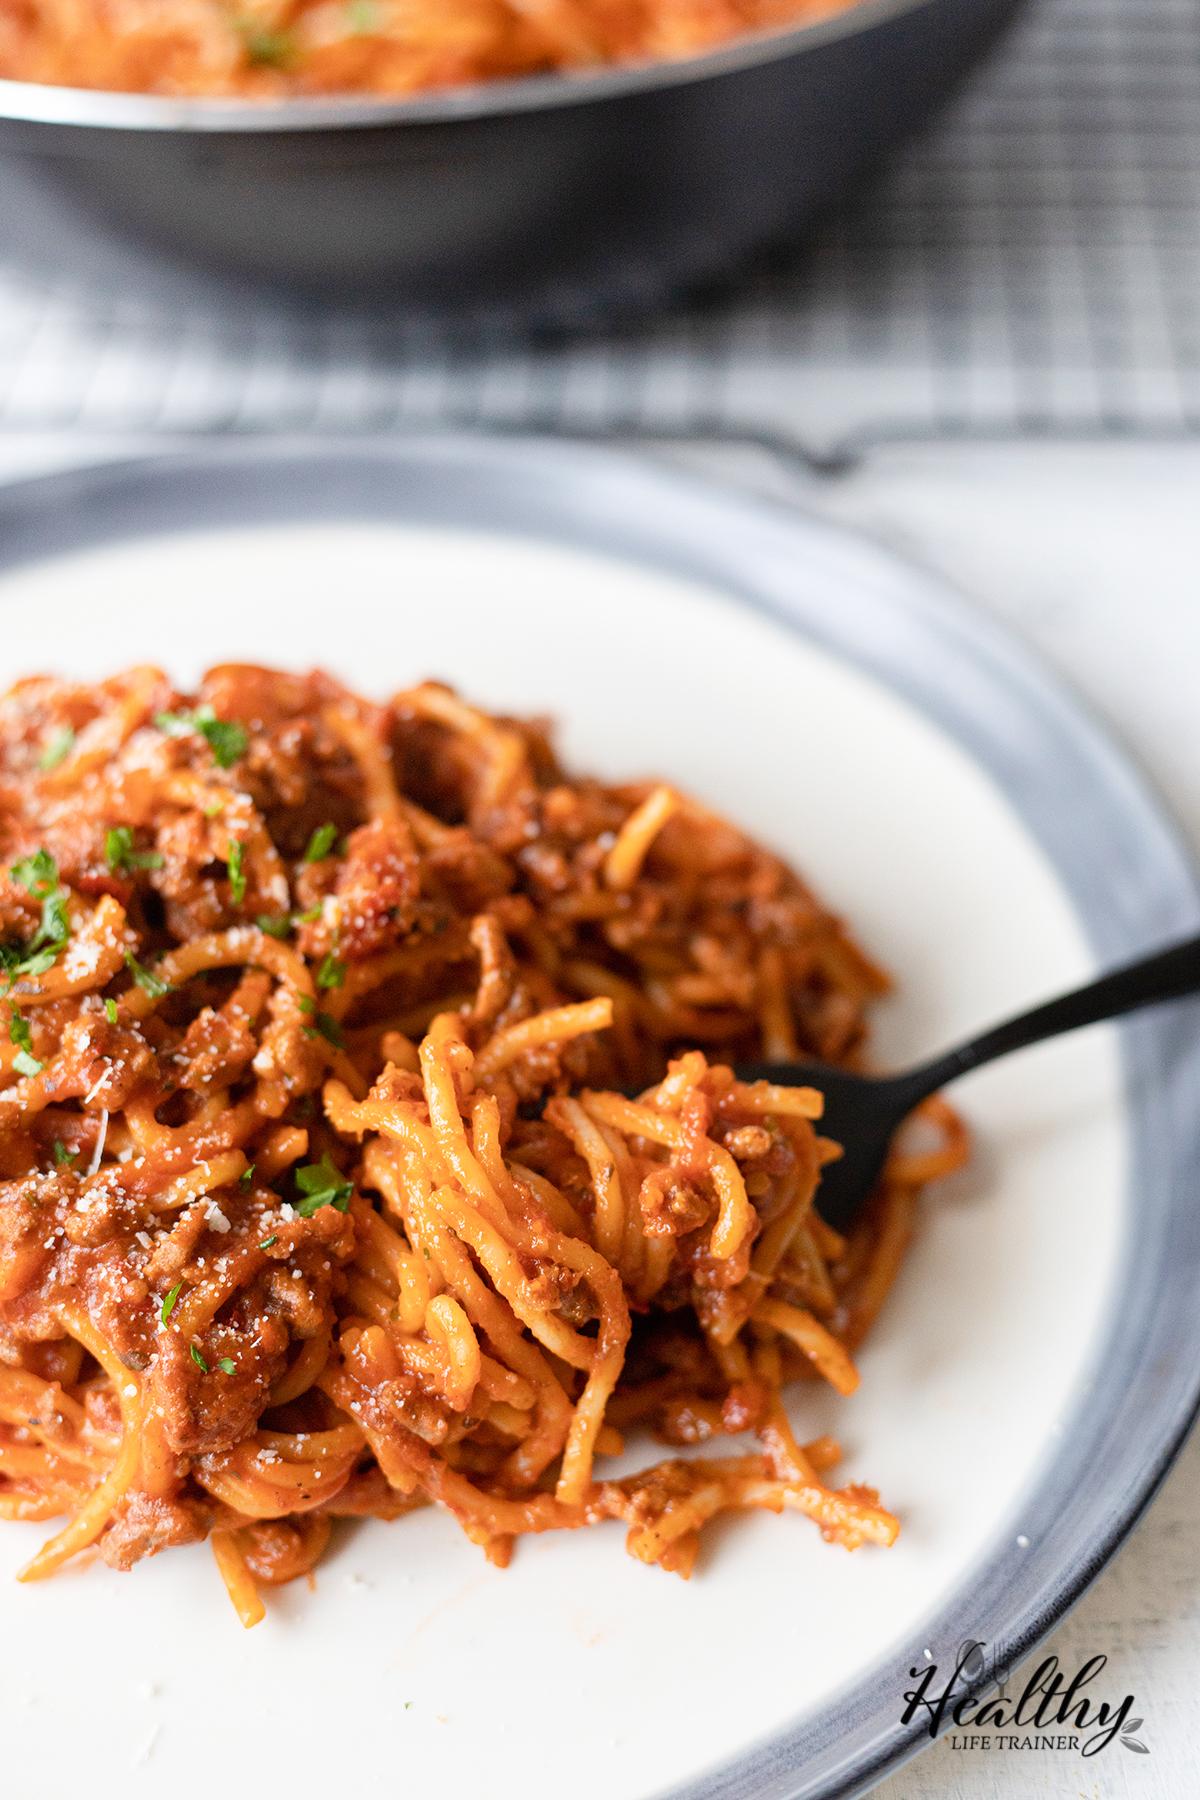 Easy One-Pot Spaghetti Bolognese